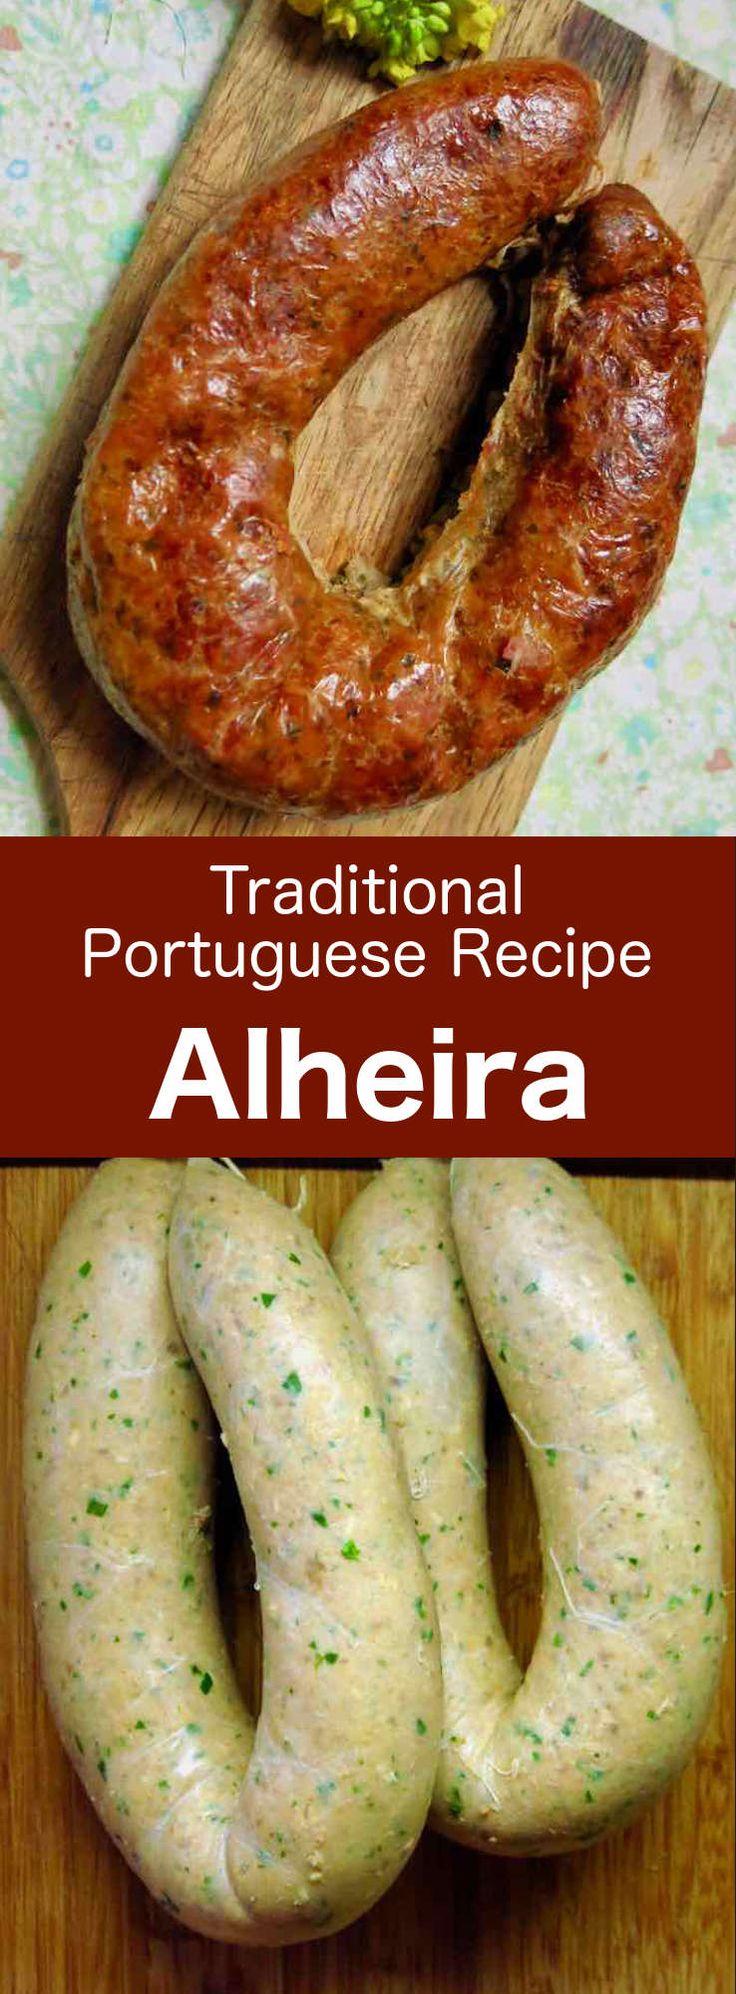 Portuguese Recipes, Stuffed Hot Peppers, Food